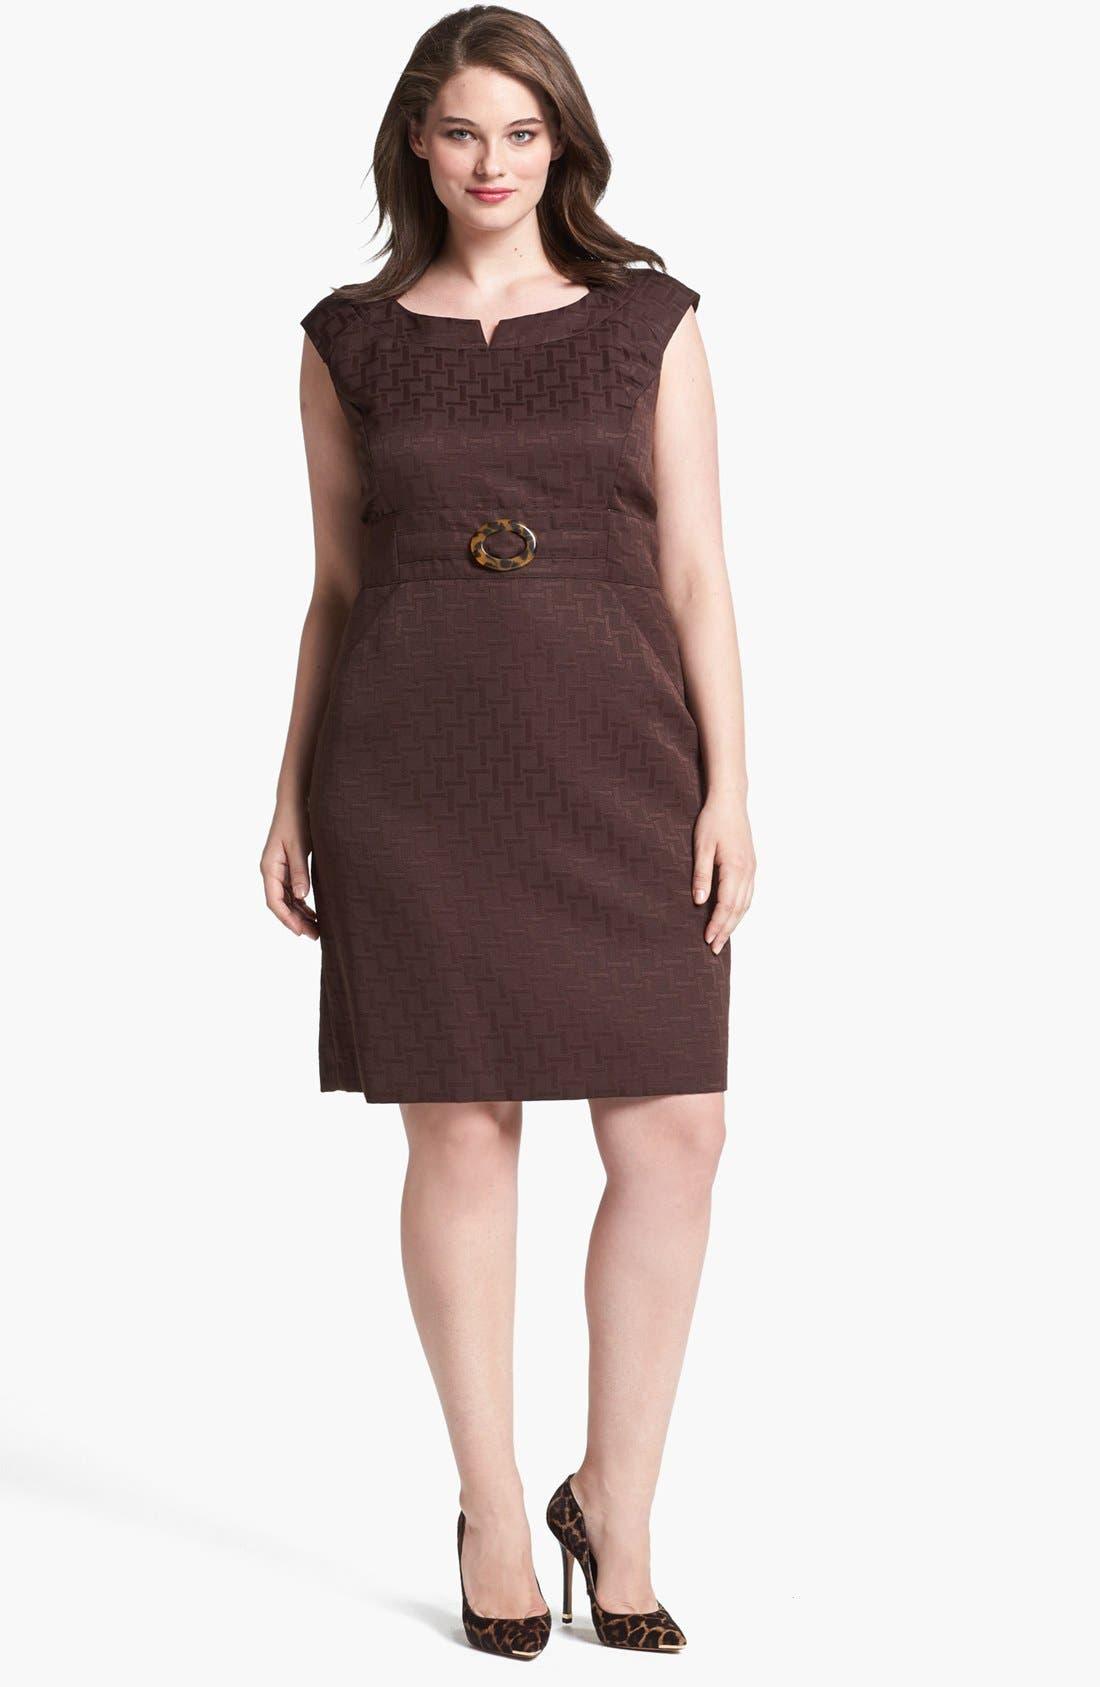 Alternate Image 1 Selected - Tahari Jacquard Sheath Dress (Plus Size)